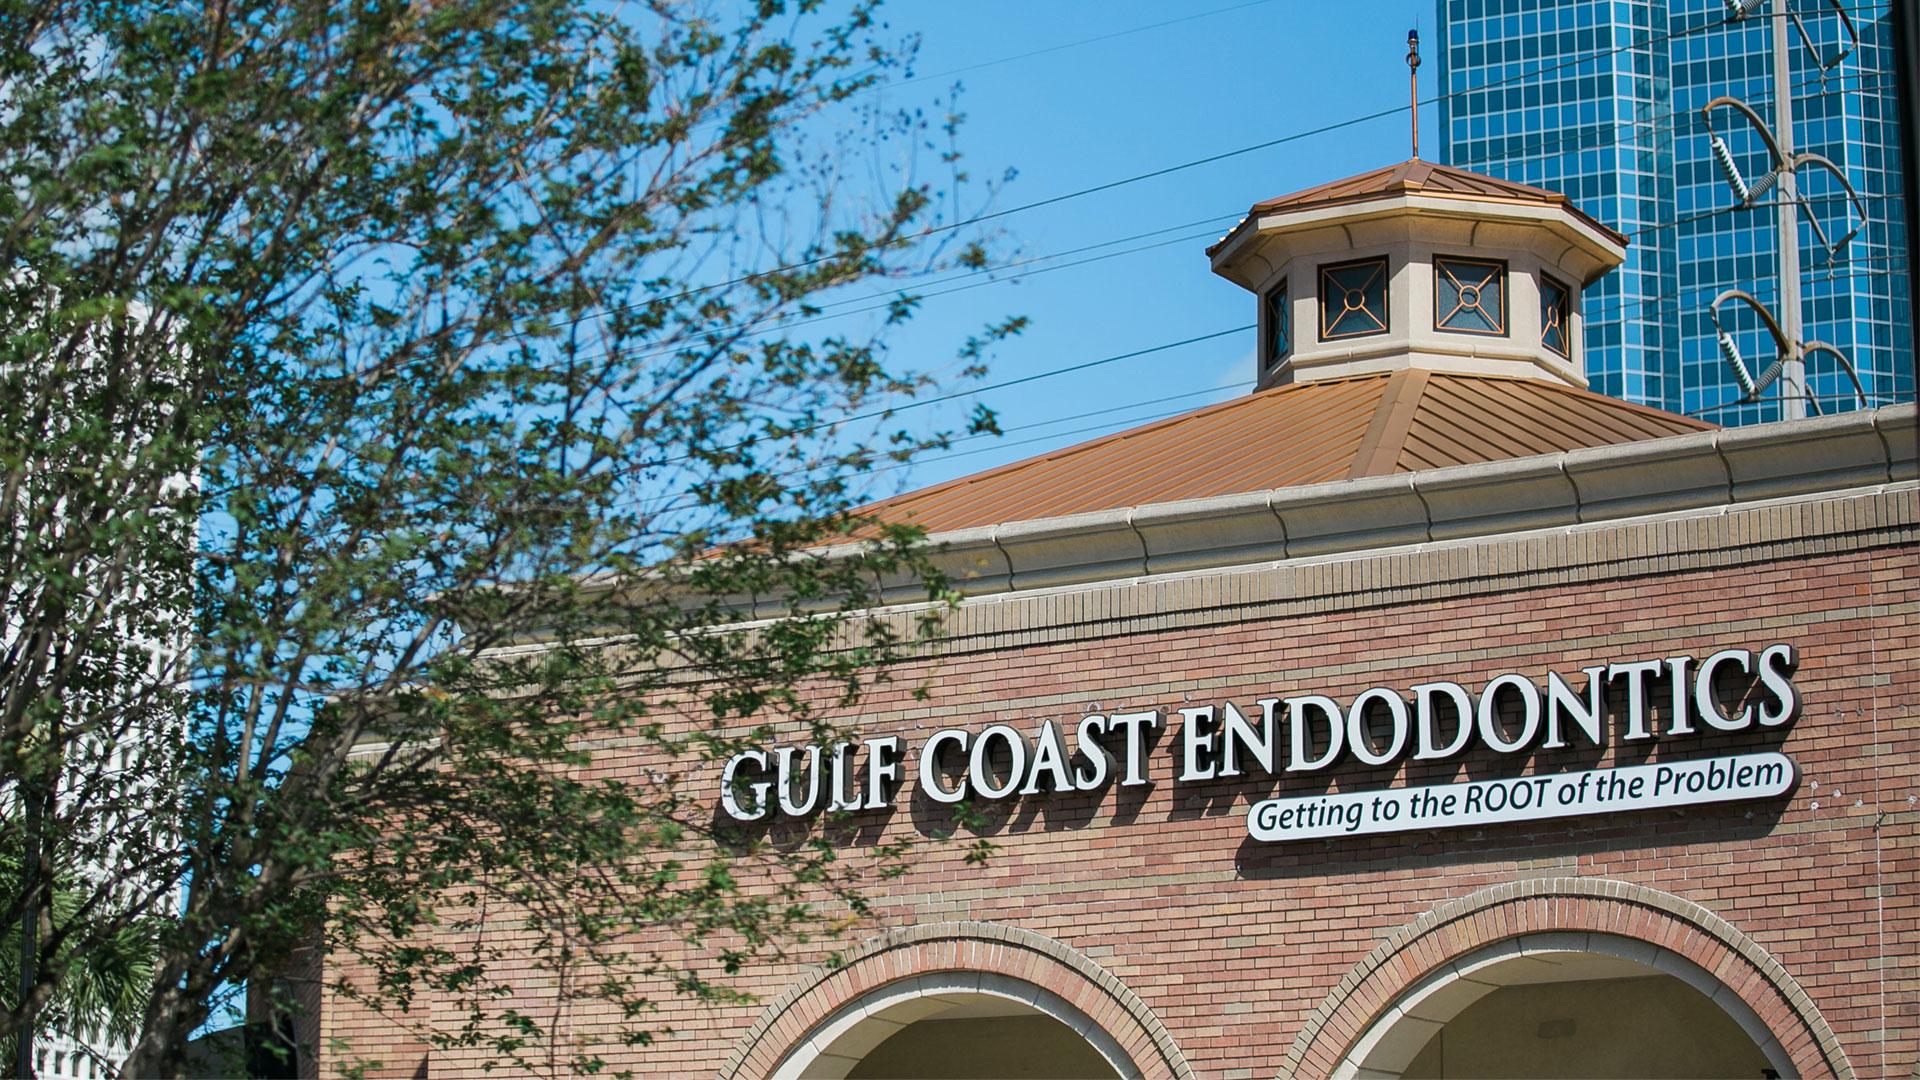 slide-6-gulf-coast-endodontics